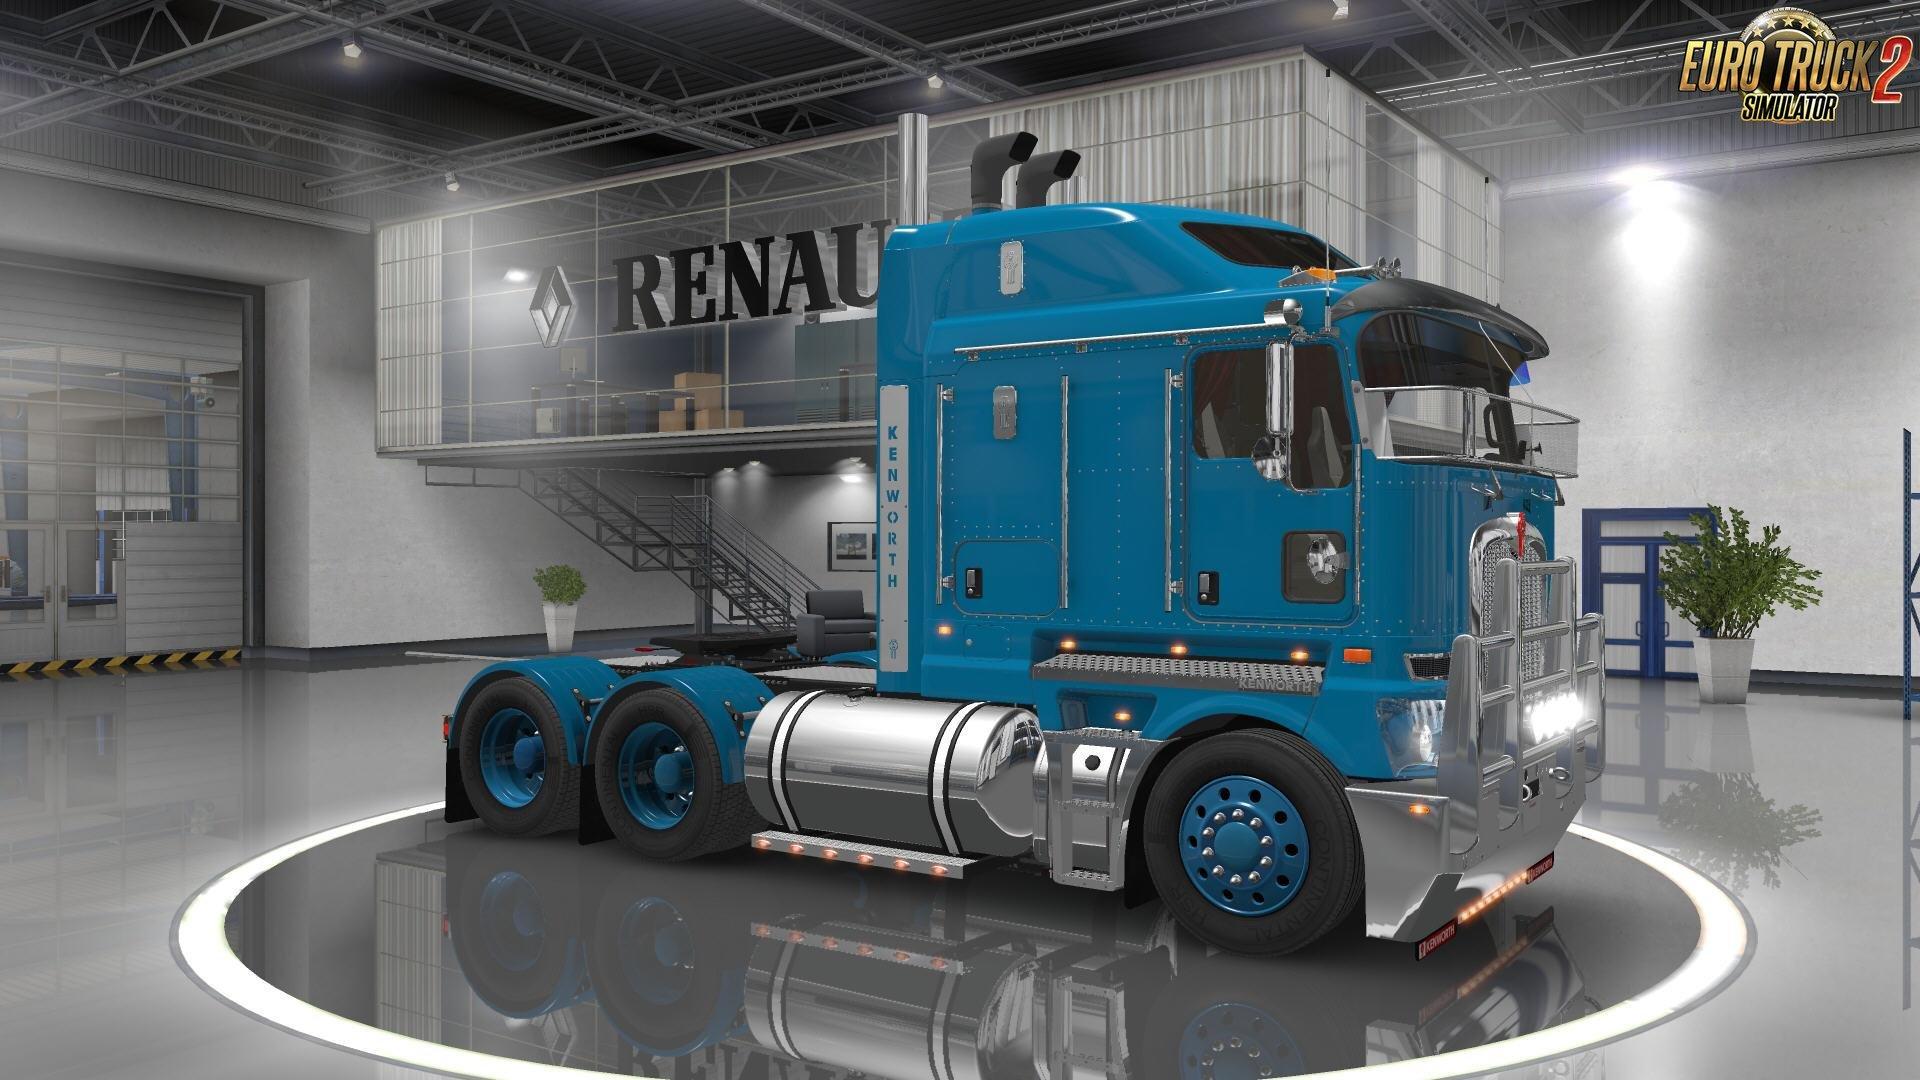 Kenworth K200 + Interior v14.0 (1.26.x) » Download ETS 2 mods | Truck mods | Euro Truck Simulator 2